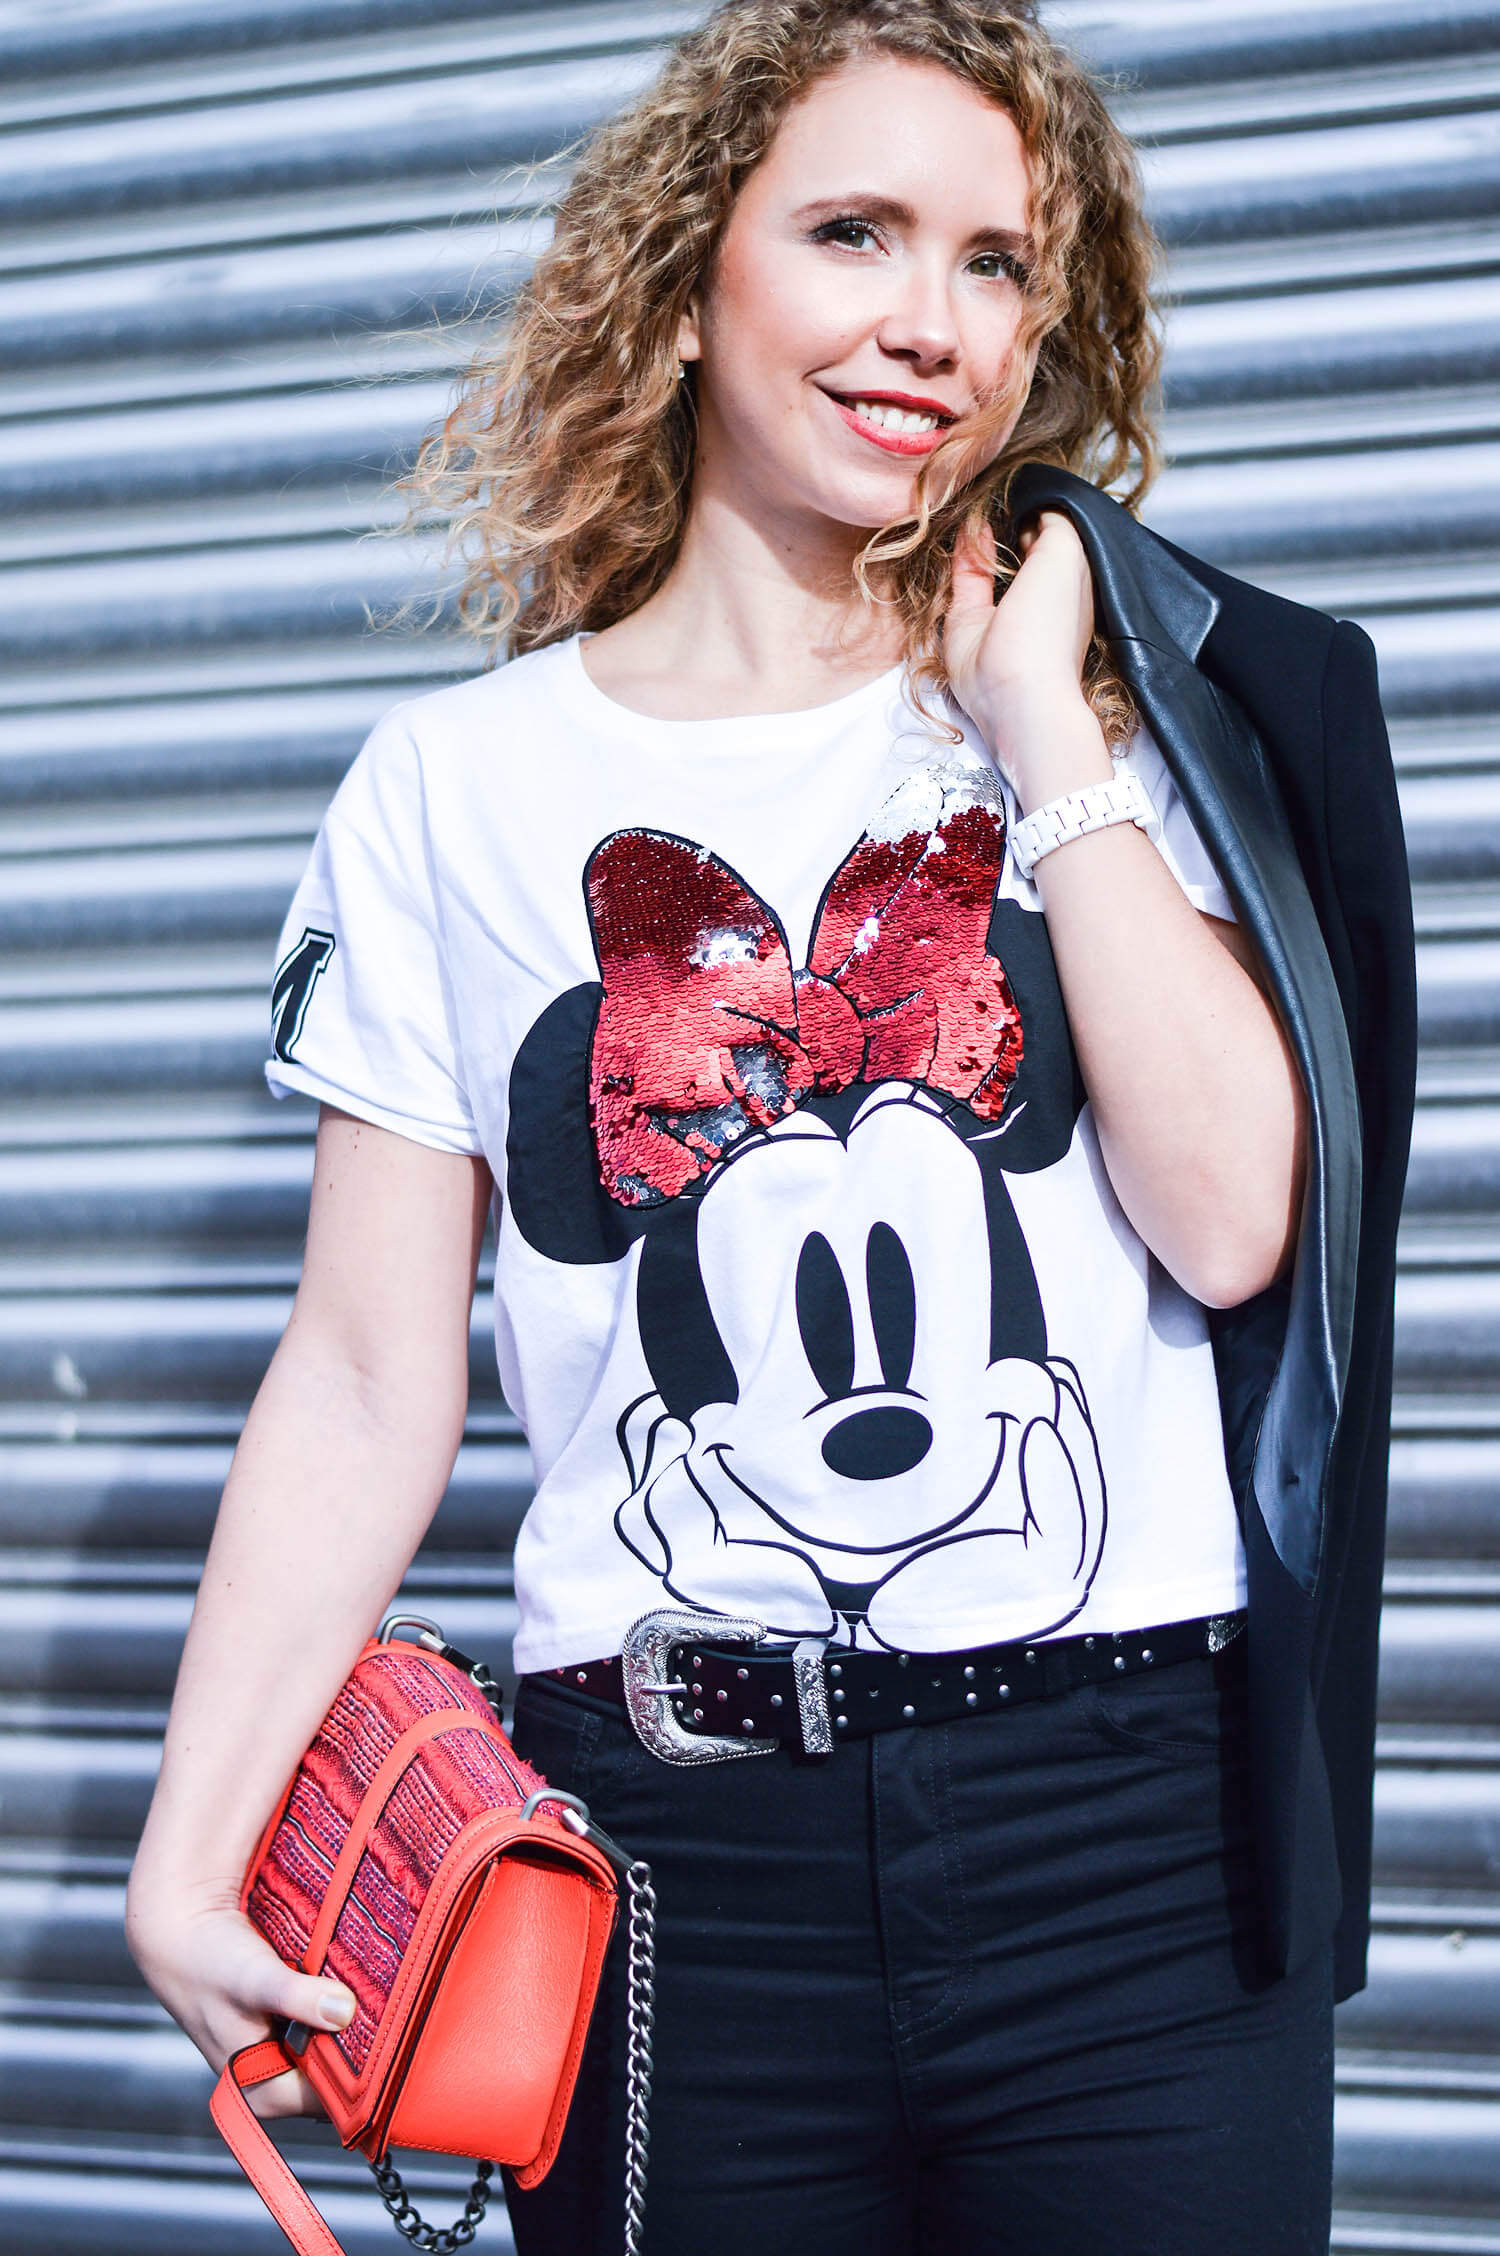 kationette-fashionblog-Outfit-Minnie-Mouse-HighWaist-Denim-Fishnet-stockings-RebeccaMinkoff-crossbody-curls